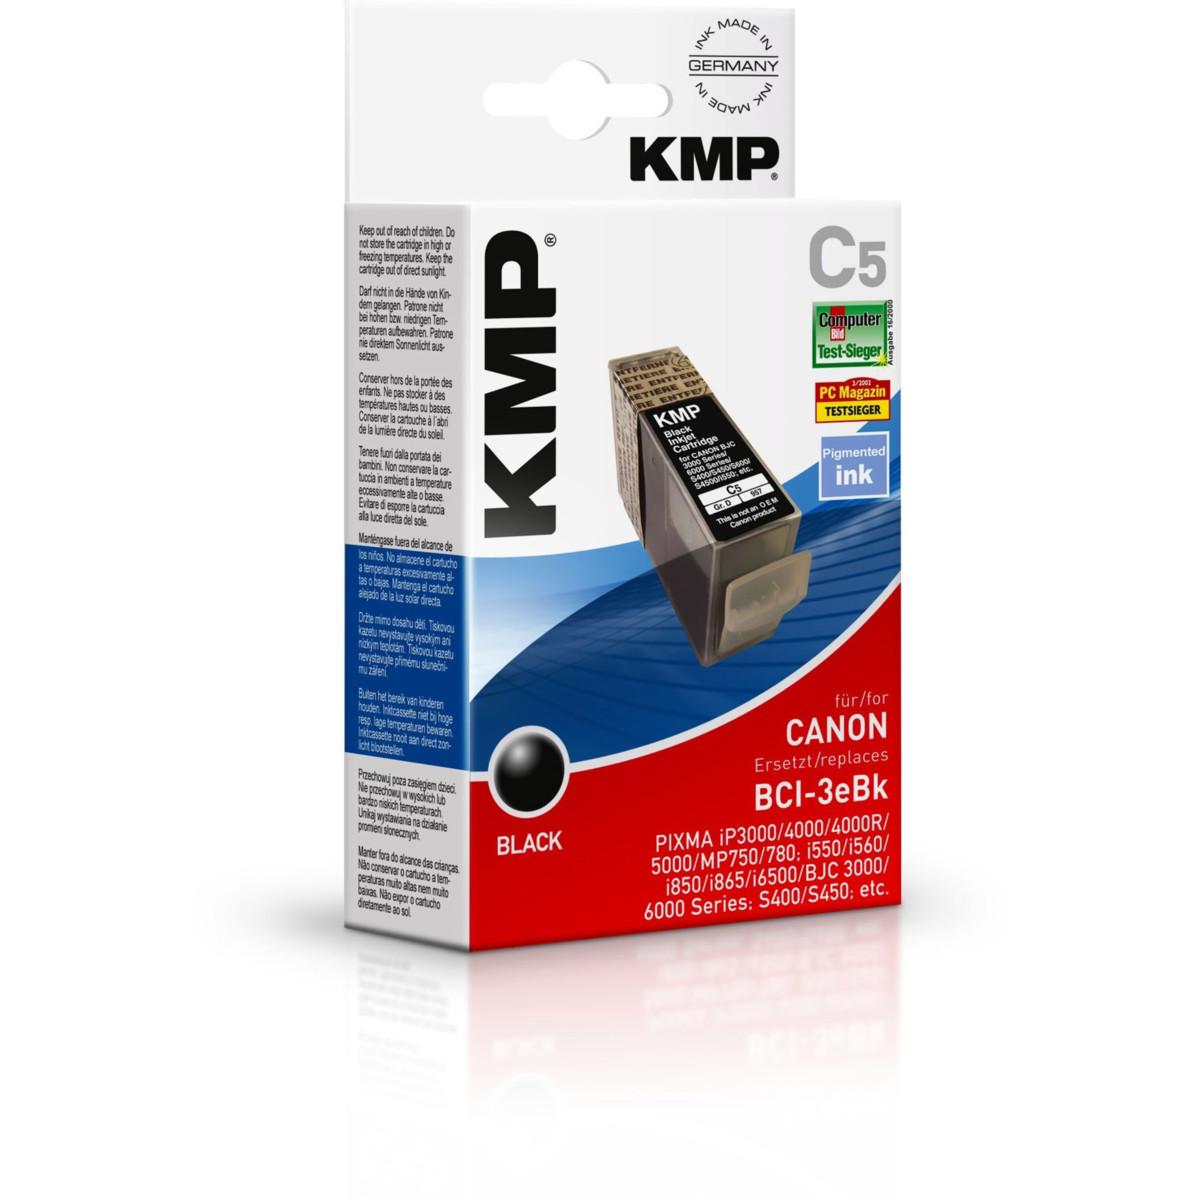 KMP Cartridge Canon BCI-3eBK, - kompatibilný s čipom (Čierna)